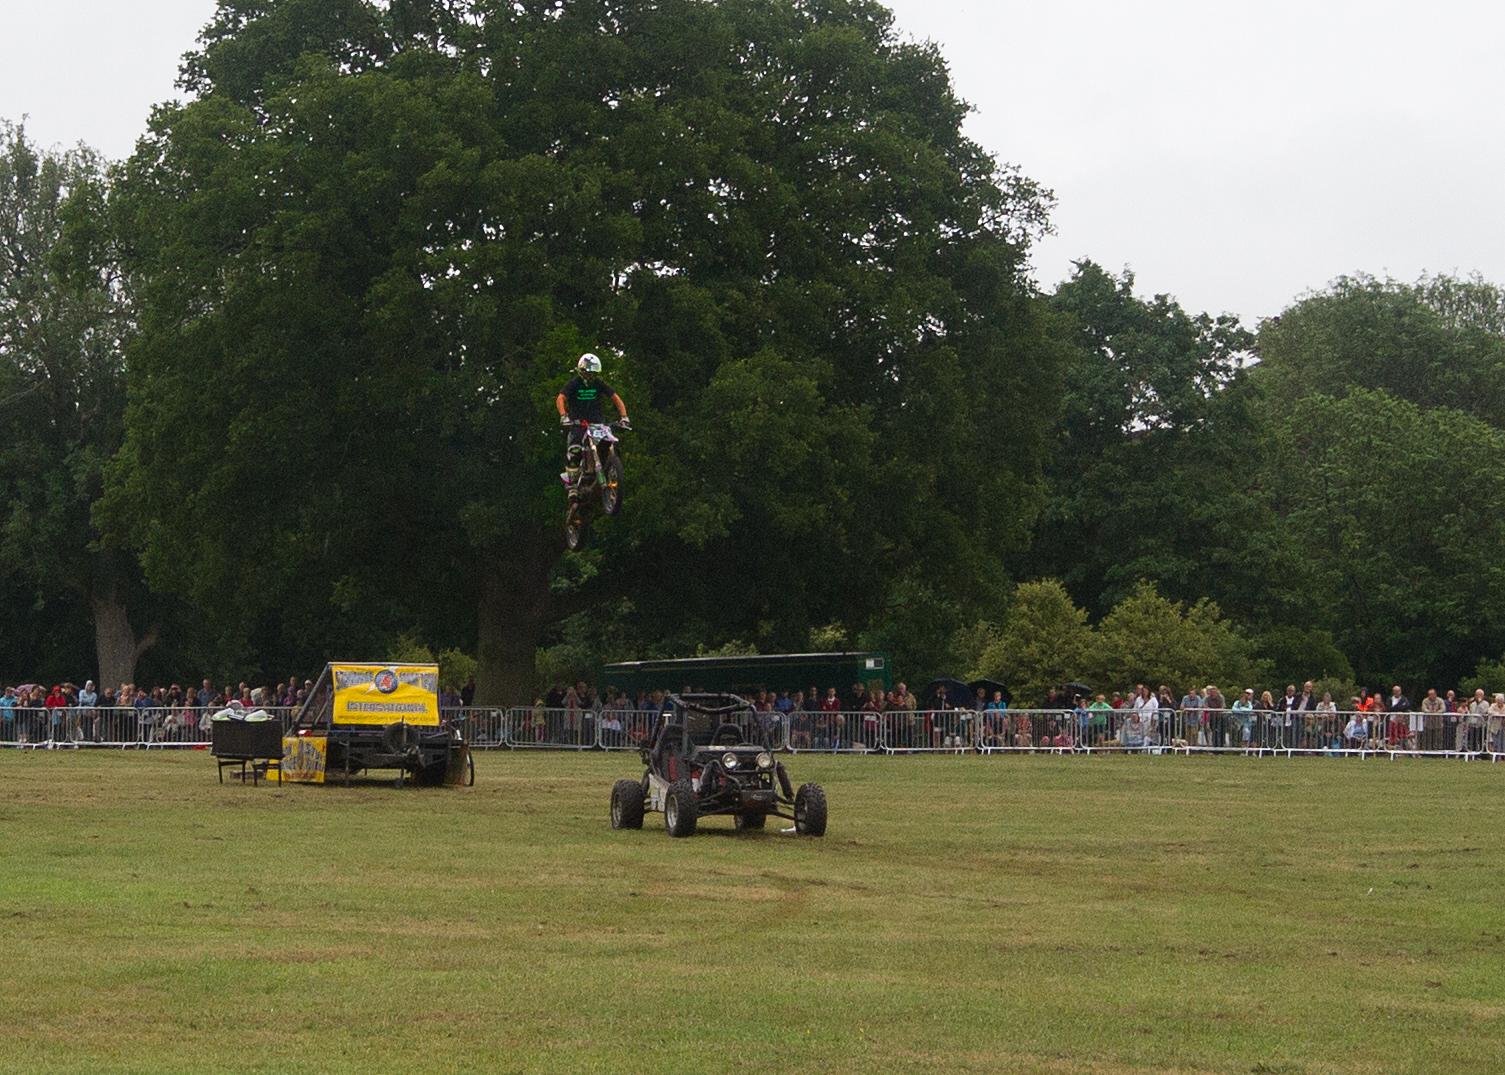 Flying bike 2